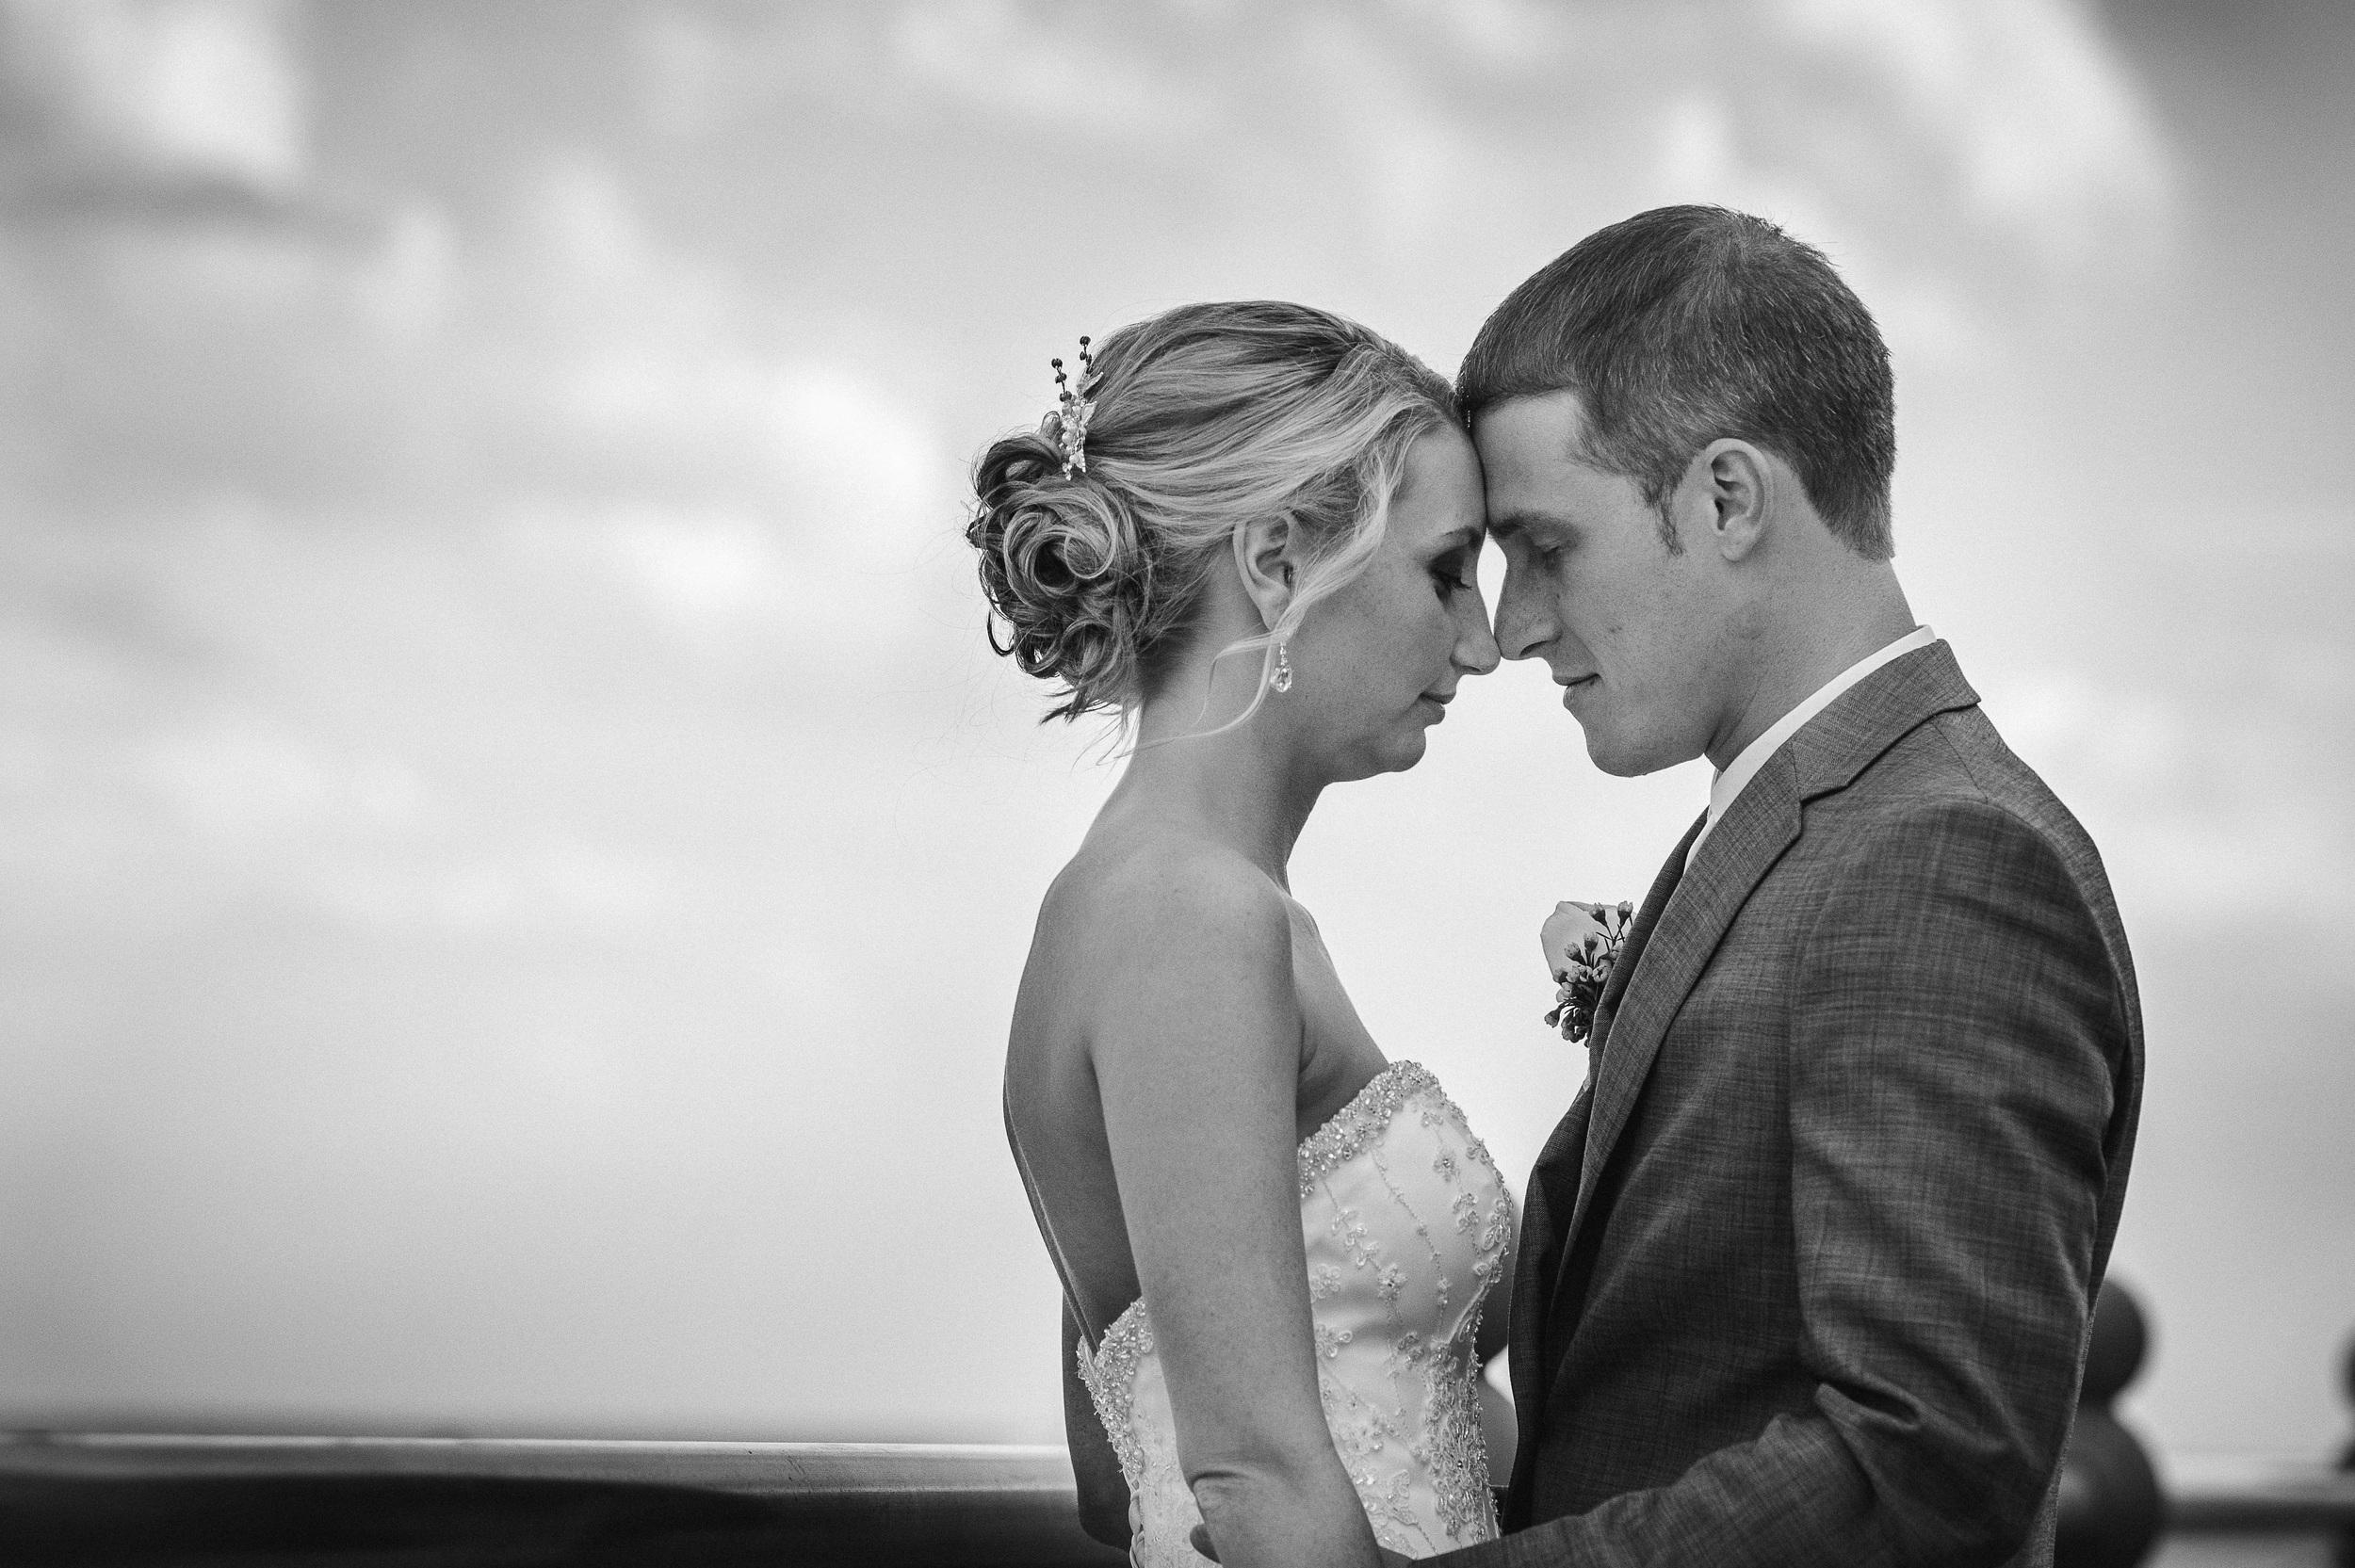 virginia-beach-documentary-wedding-photography-melissa-bliss-photography-norfolk-porstmouth-chesapeake-sandbridge-suffolk-va-beach-wedding-photographer